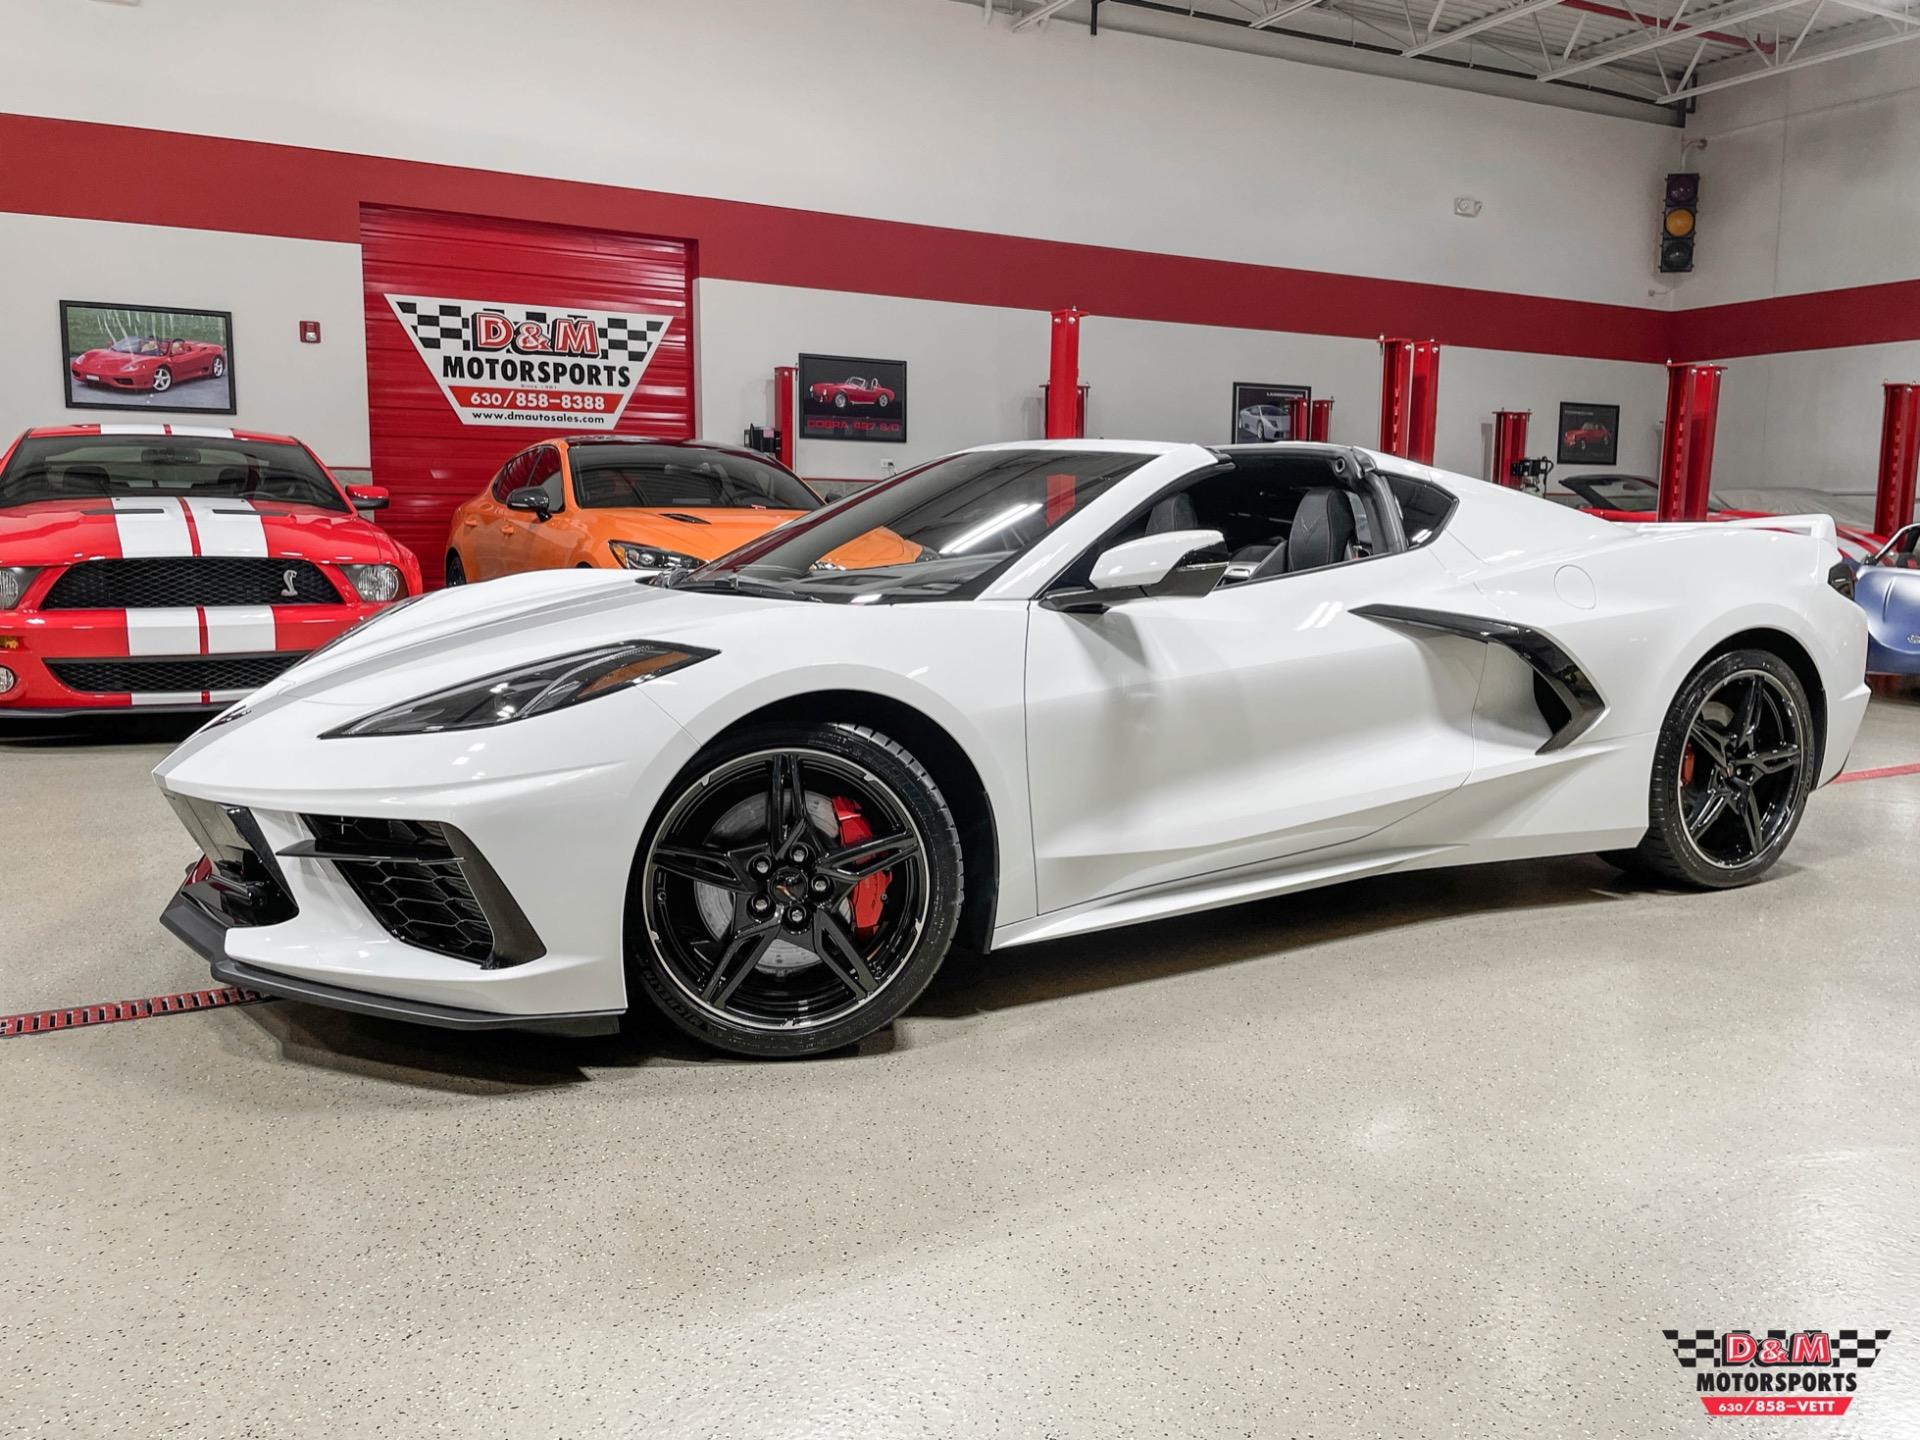 Used 2020 Chevrolet Corvette Stingray Coupe | Glen Ellyn, IL